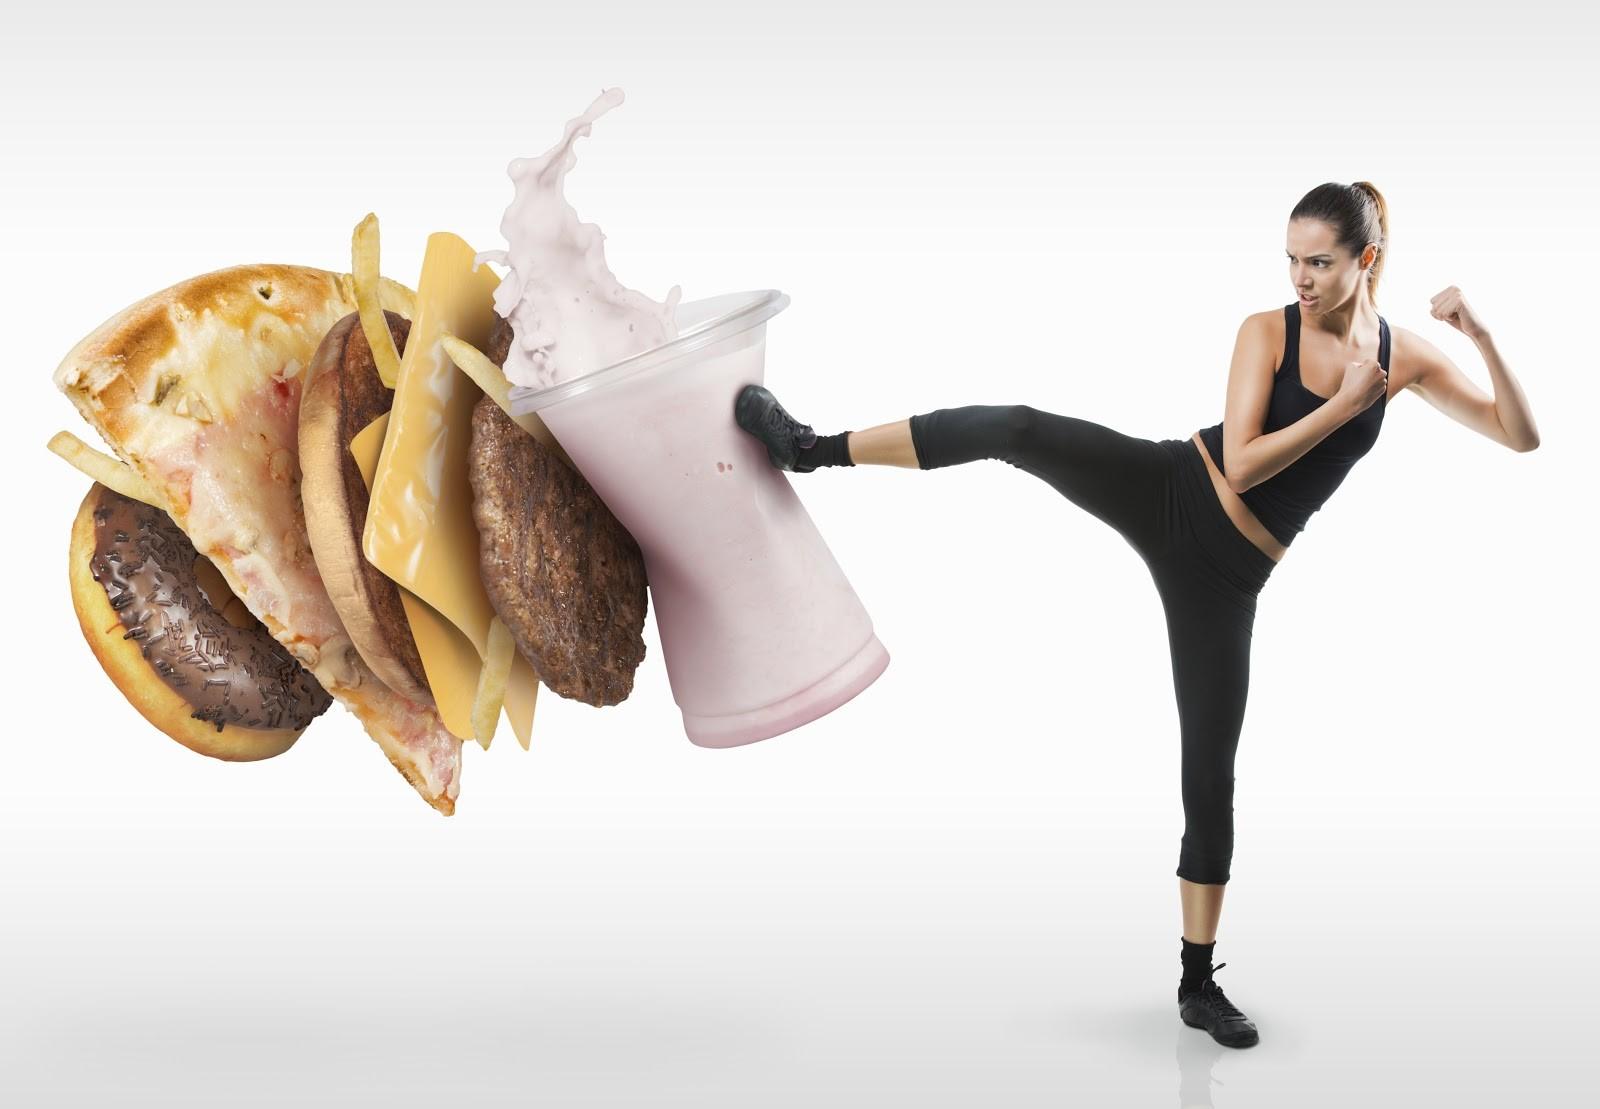 Fight fat foods